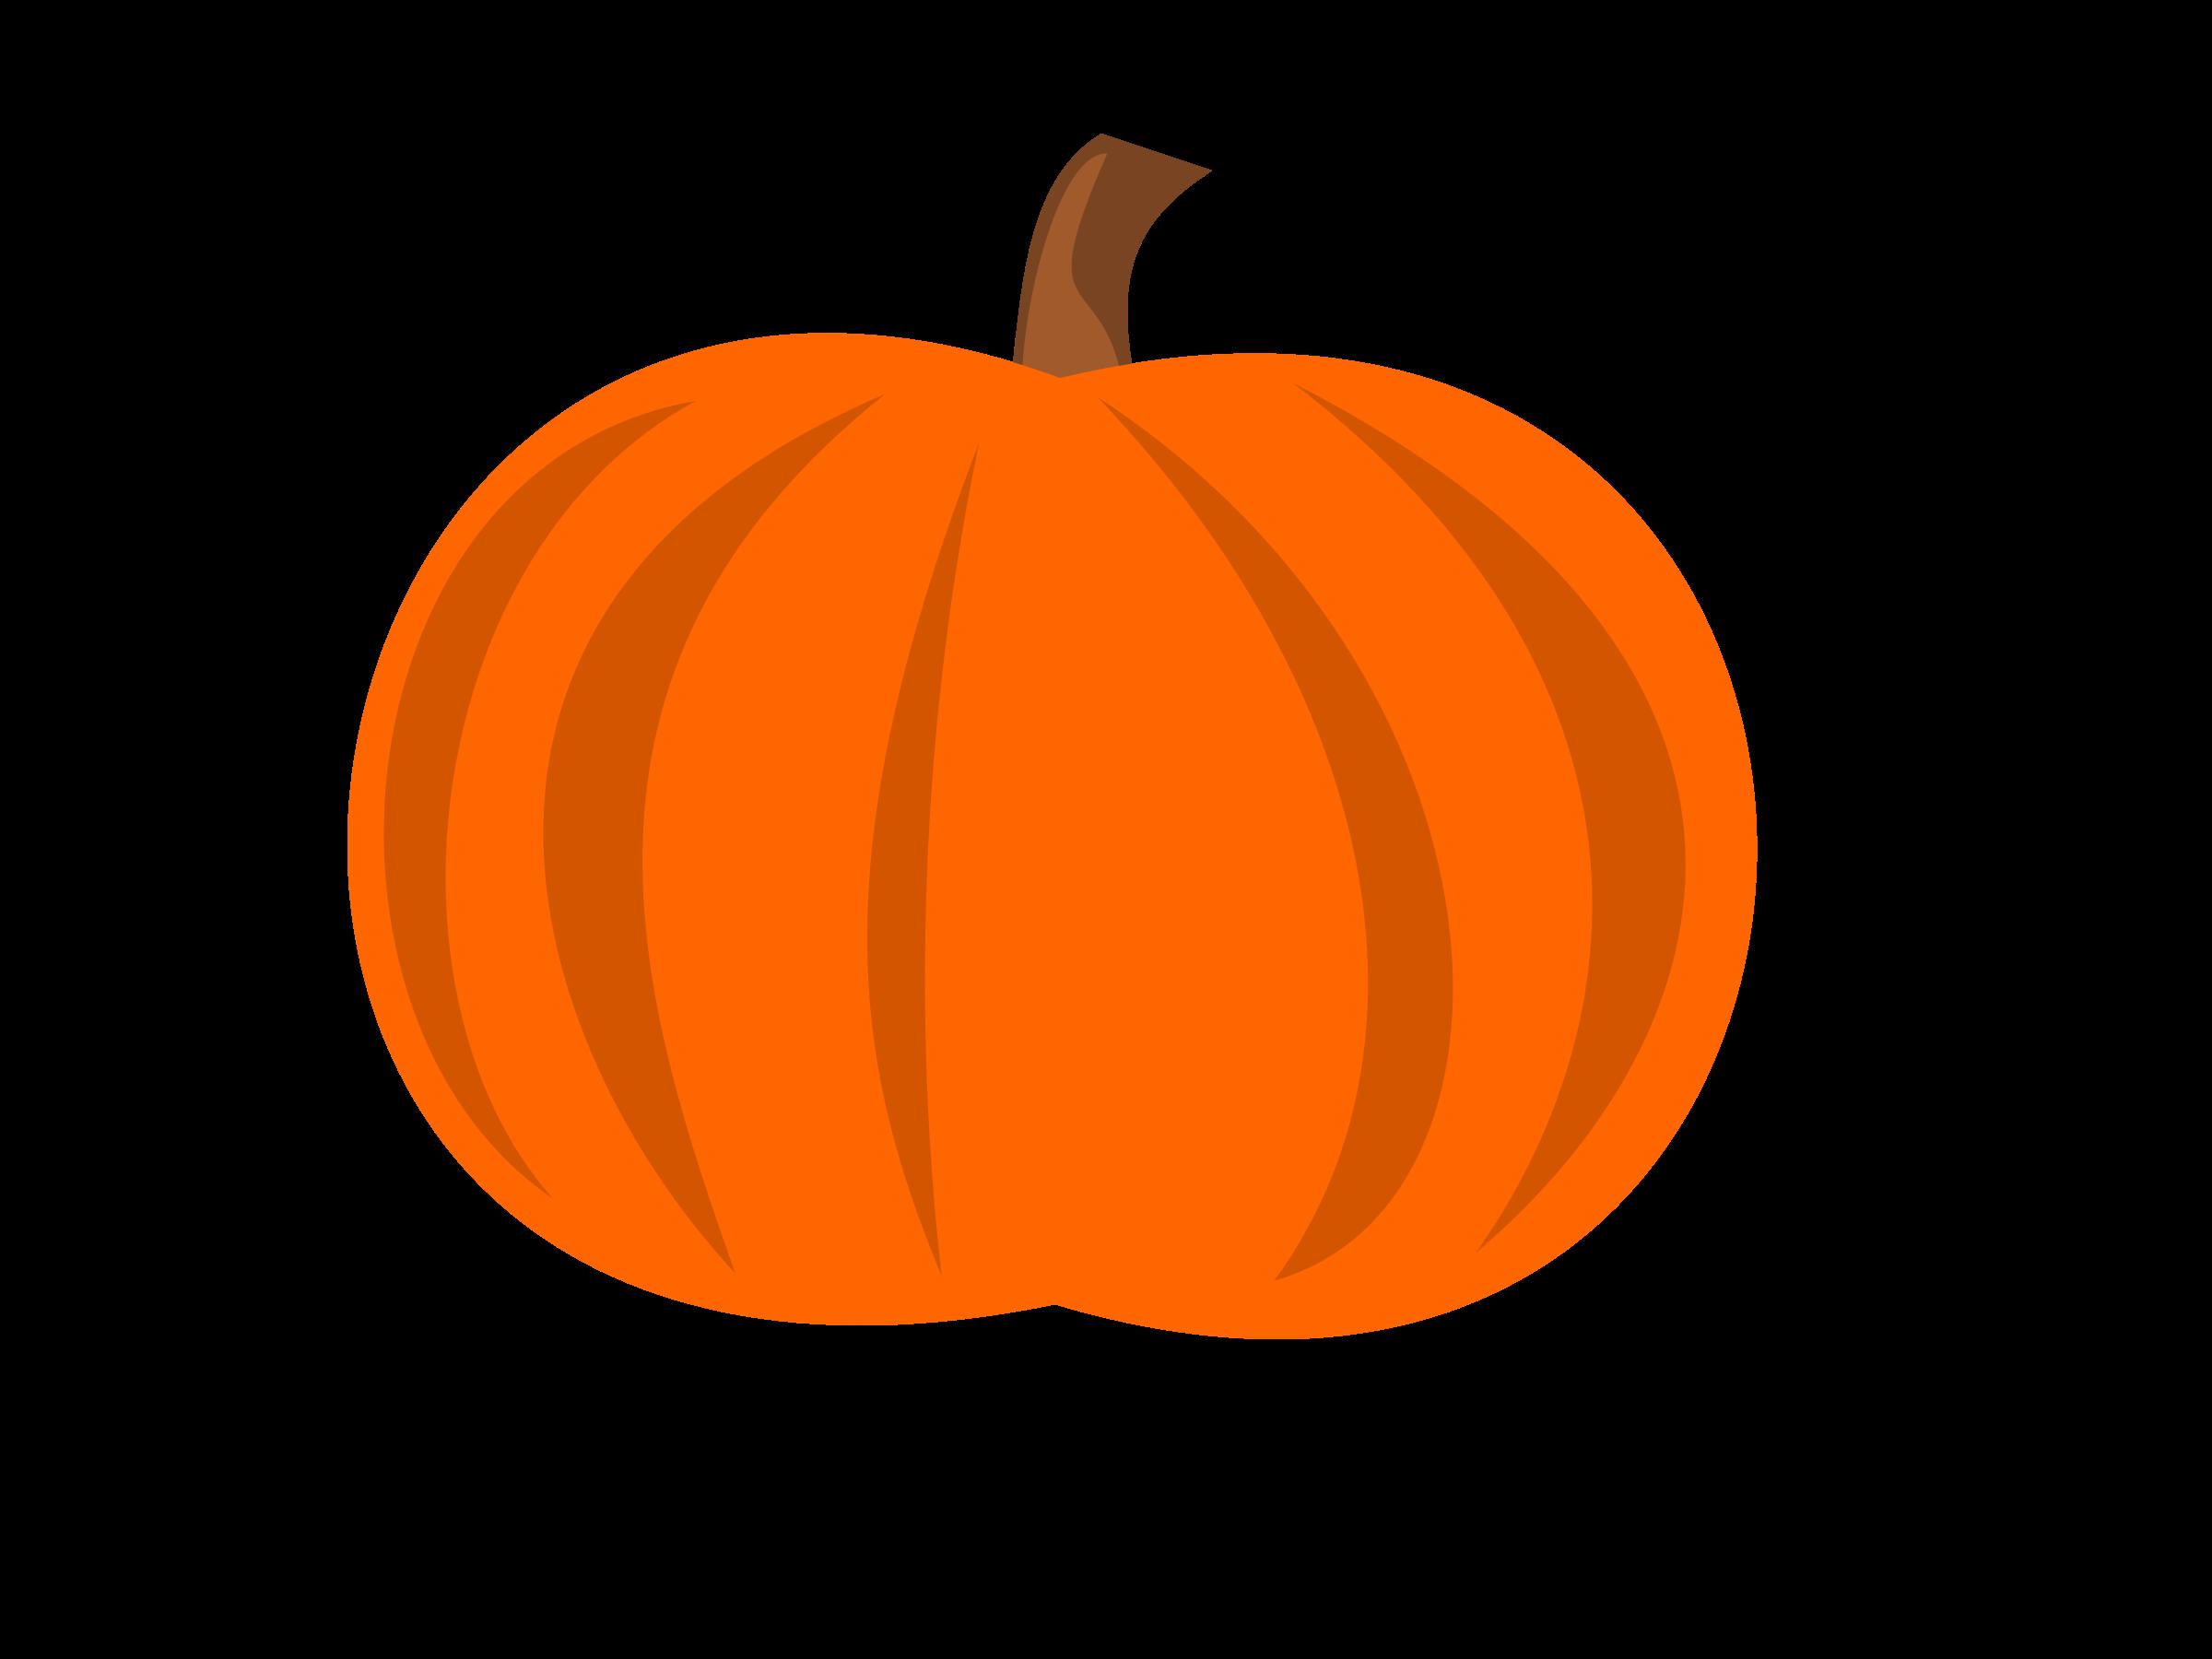 cute pumpkin black and white clipart clipart suggest